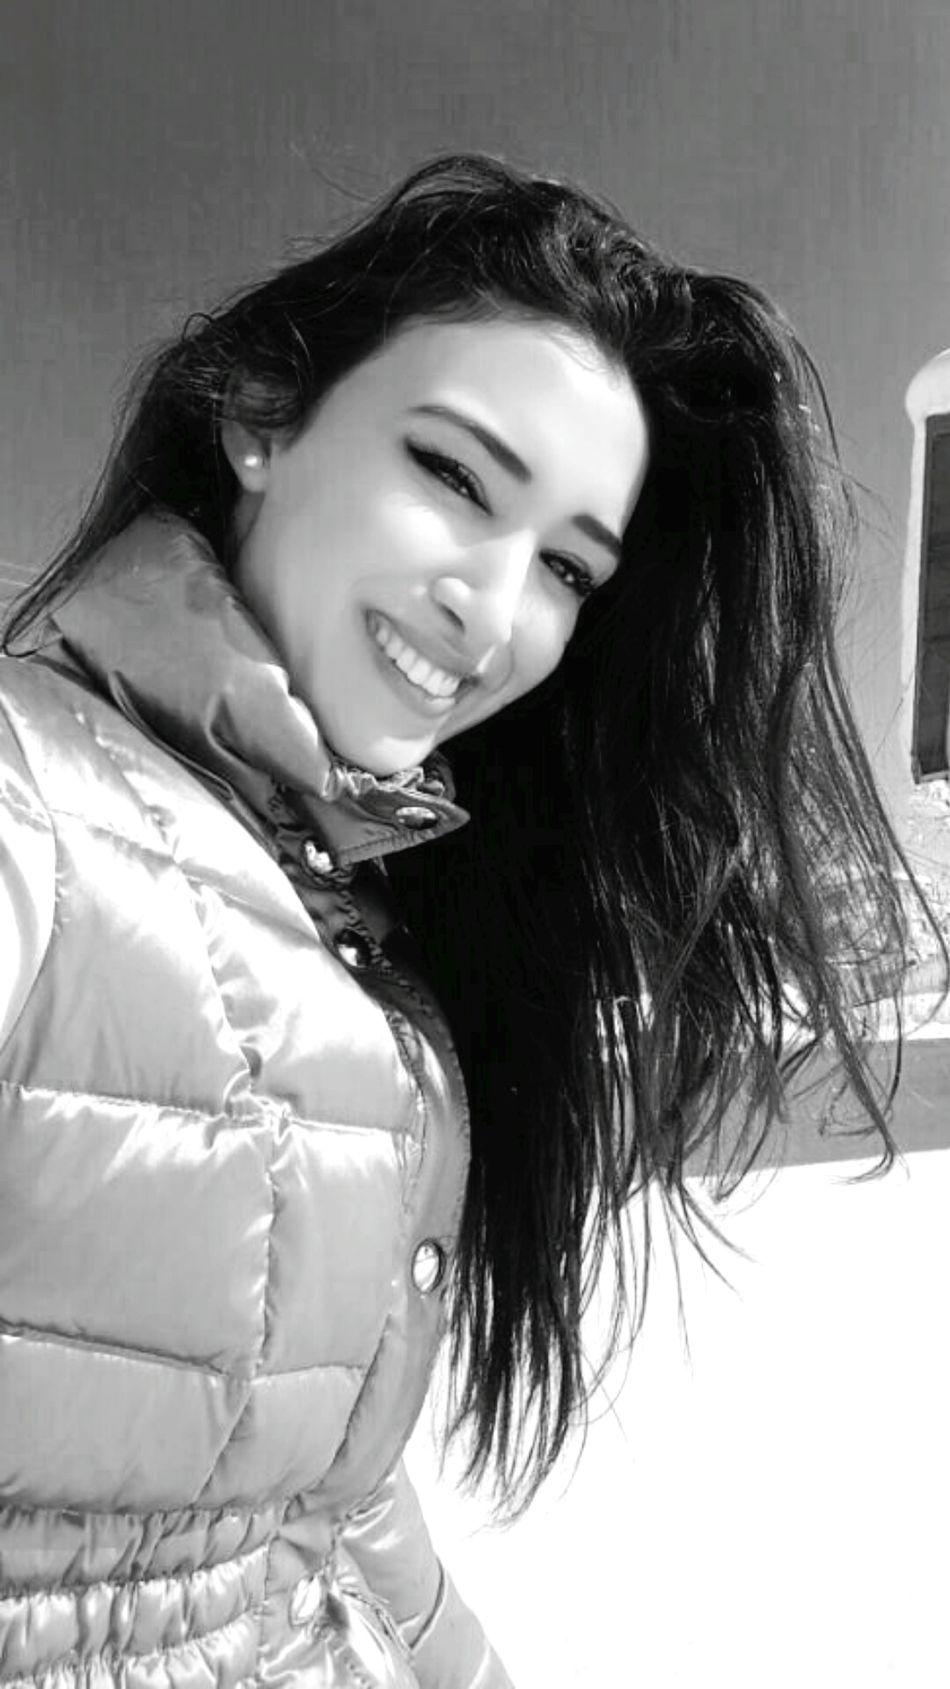 Blackandwhite Smile :) Relaxing Snow ❄